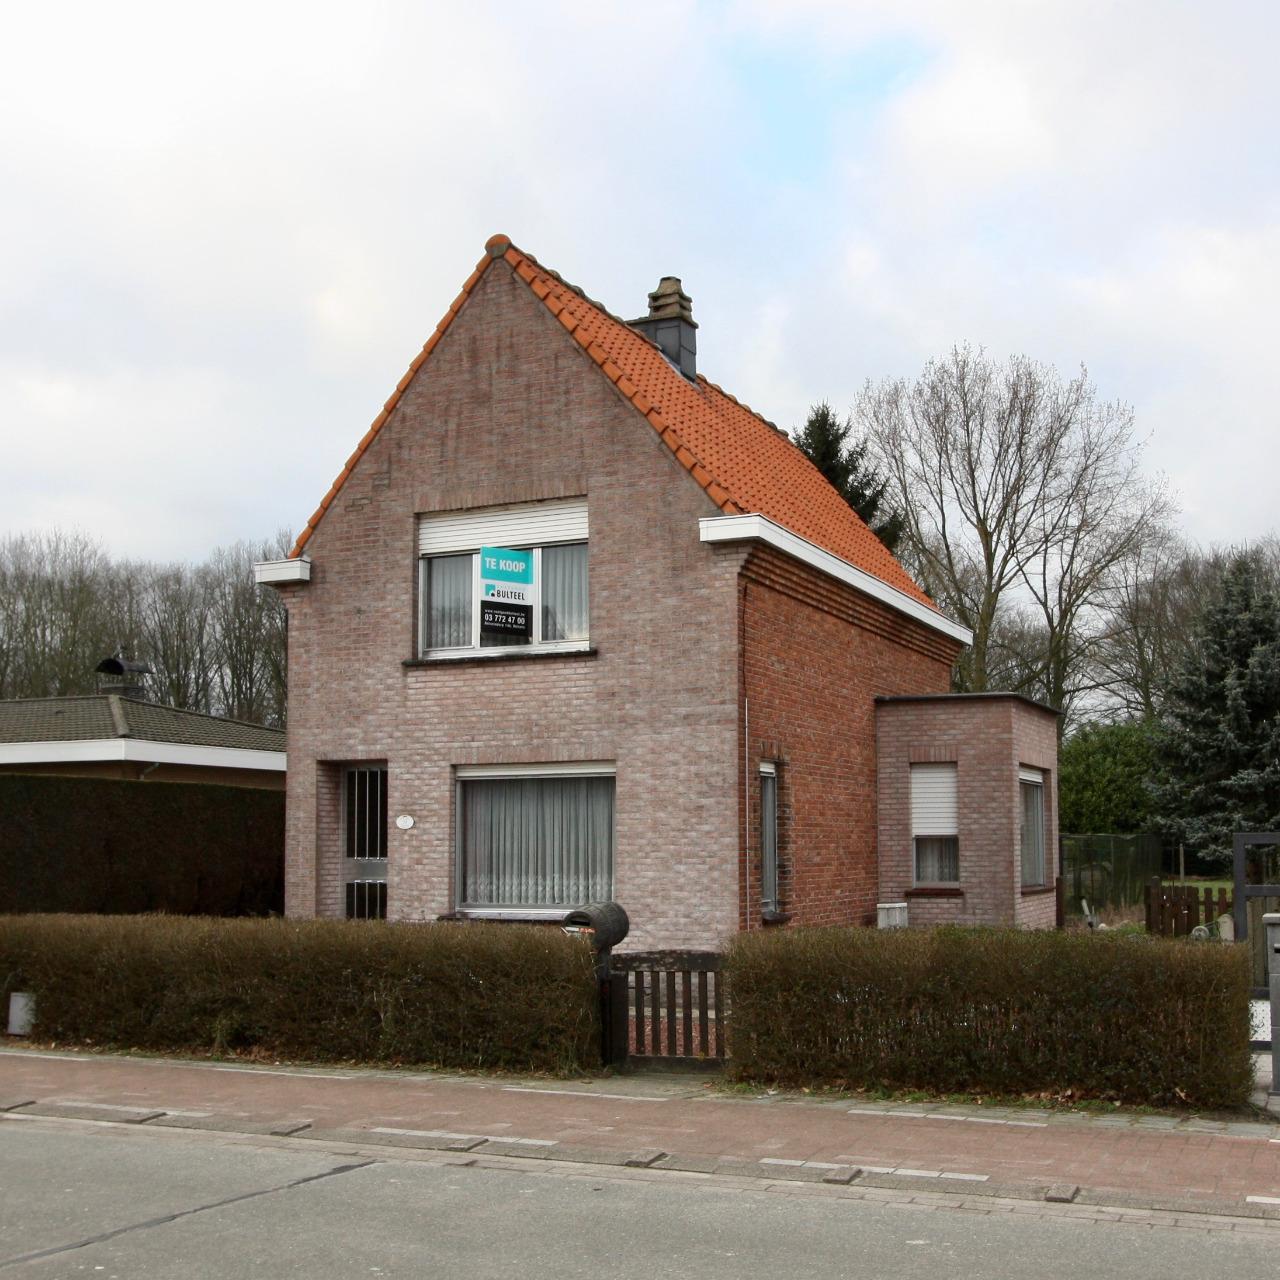 Te renoveren woning met grote tuin vastgoed bulteel for Huis te koop borgerhout met tuin